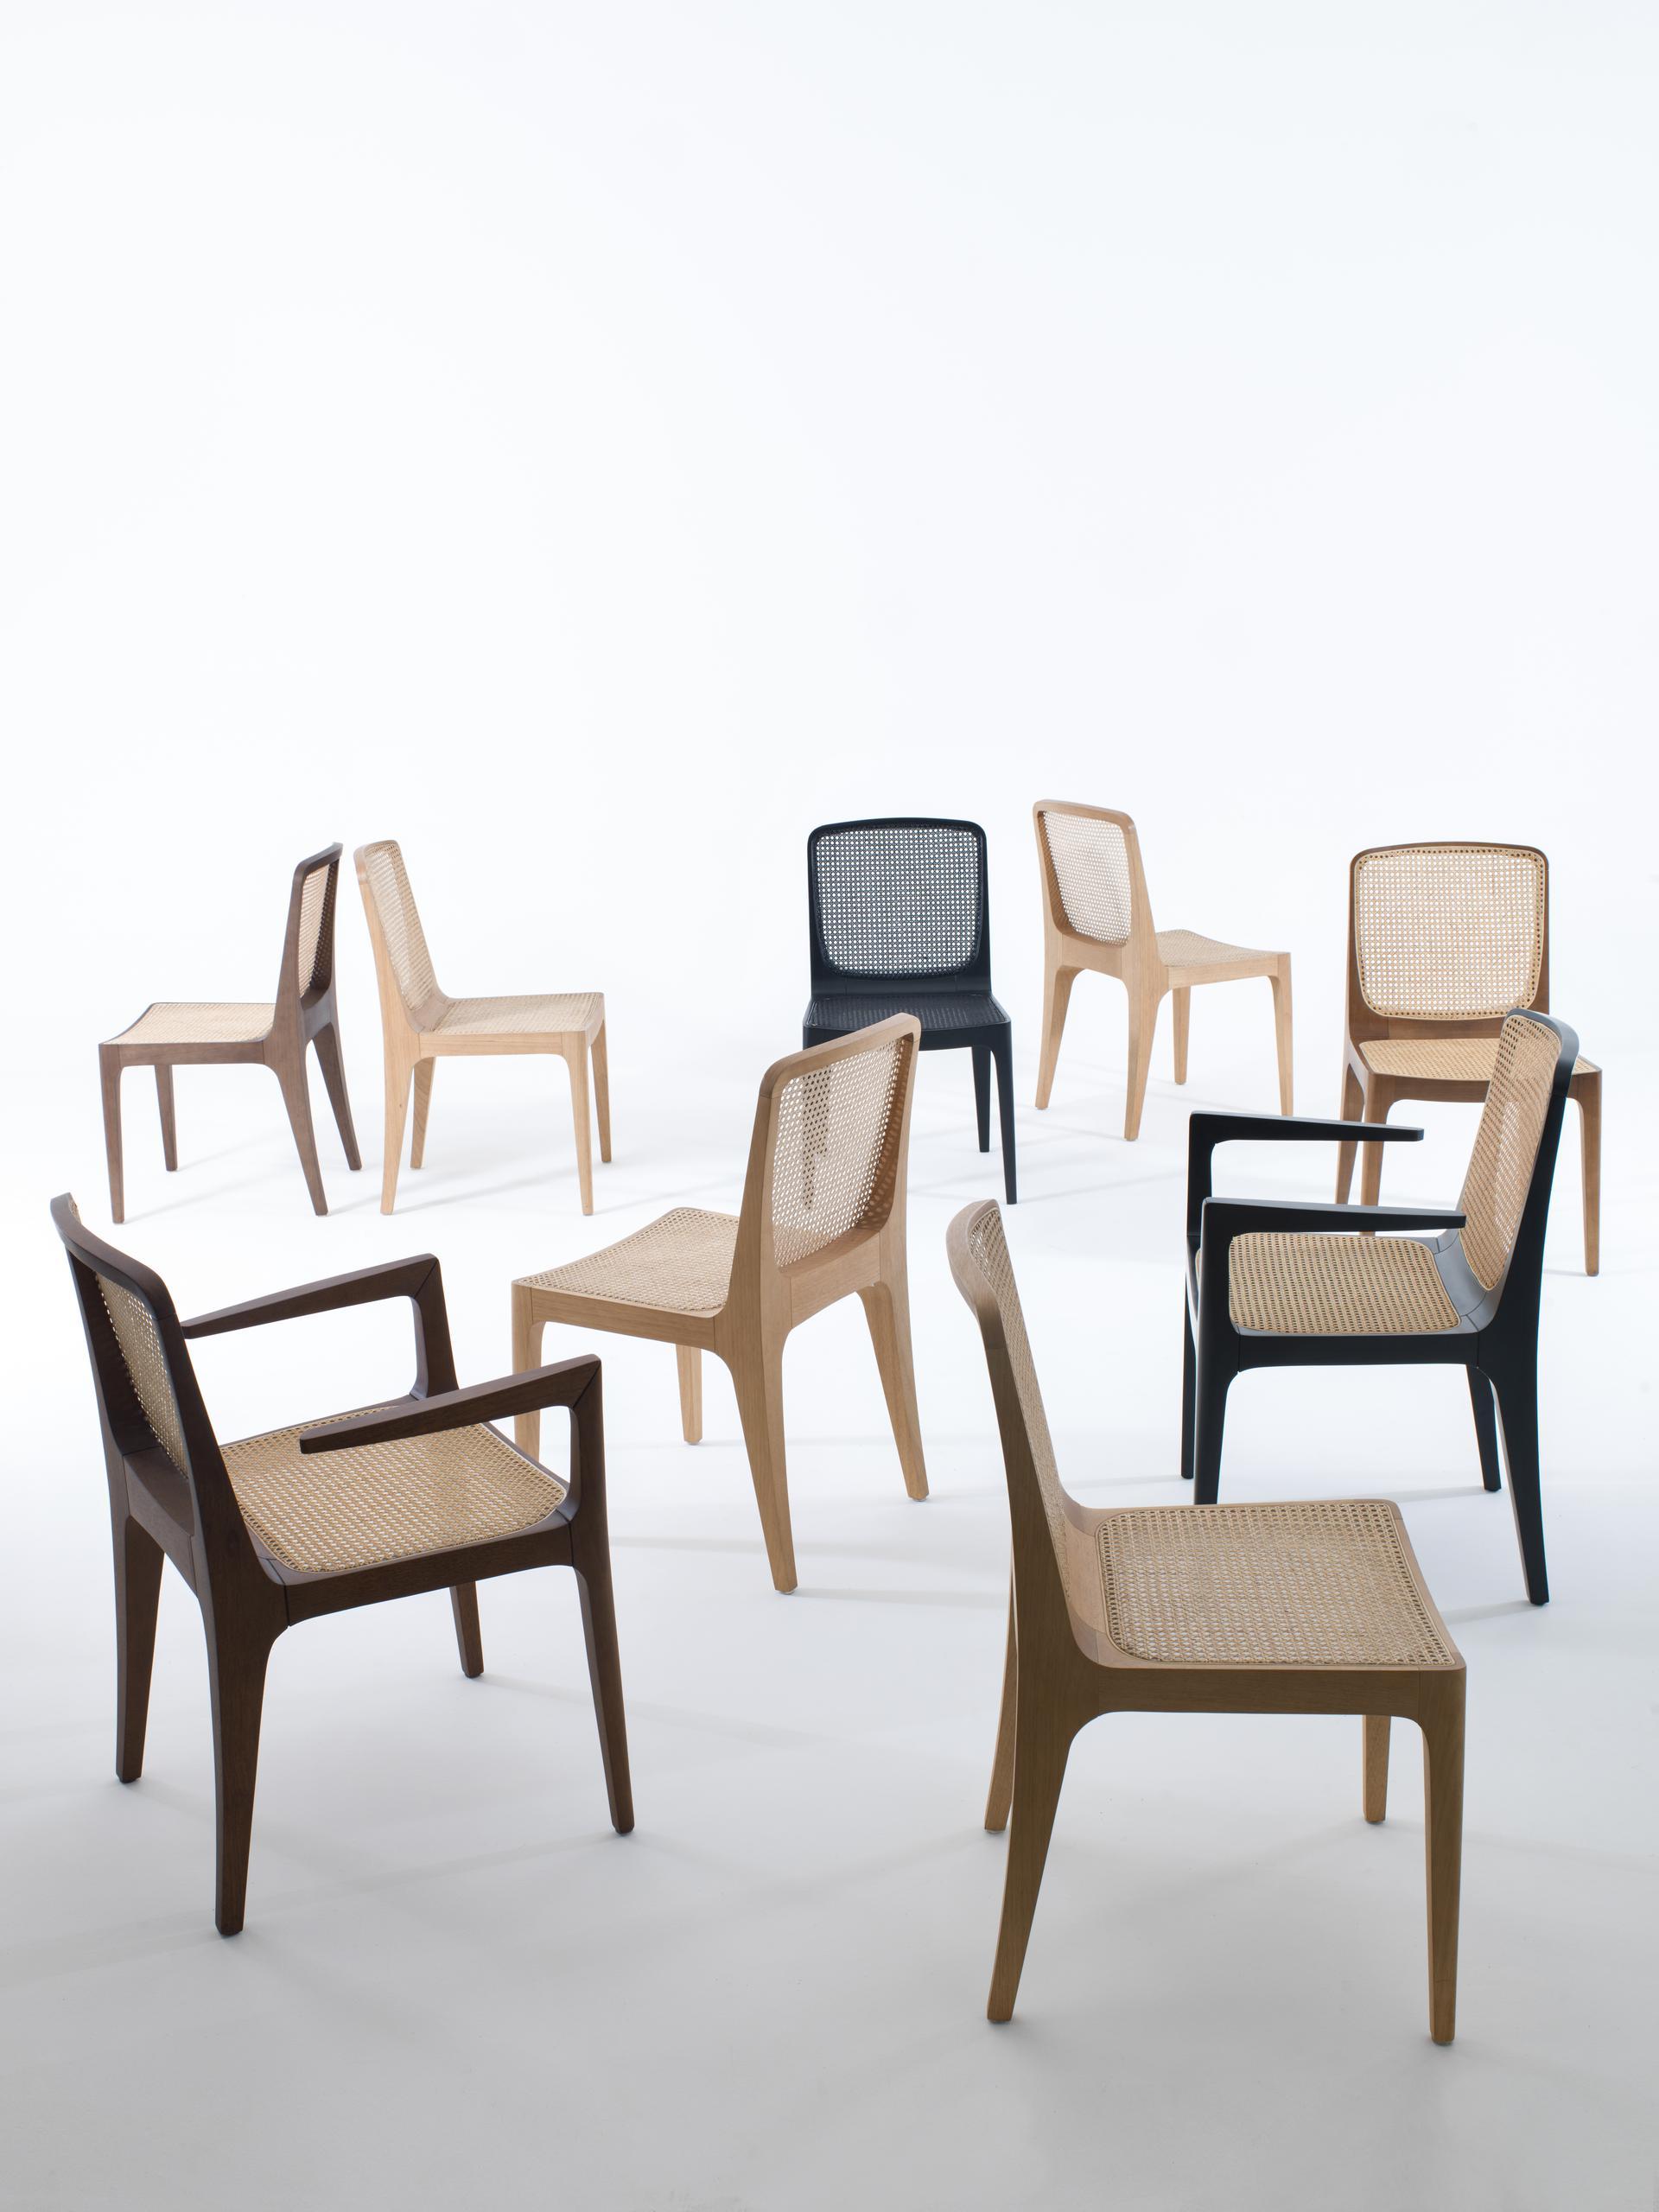 Bossa_Chair_SOLLOS_05